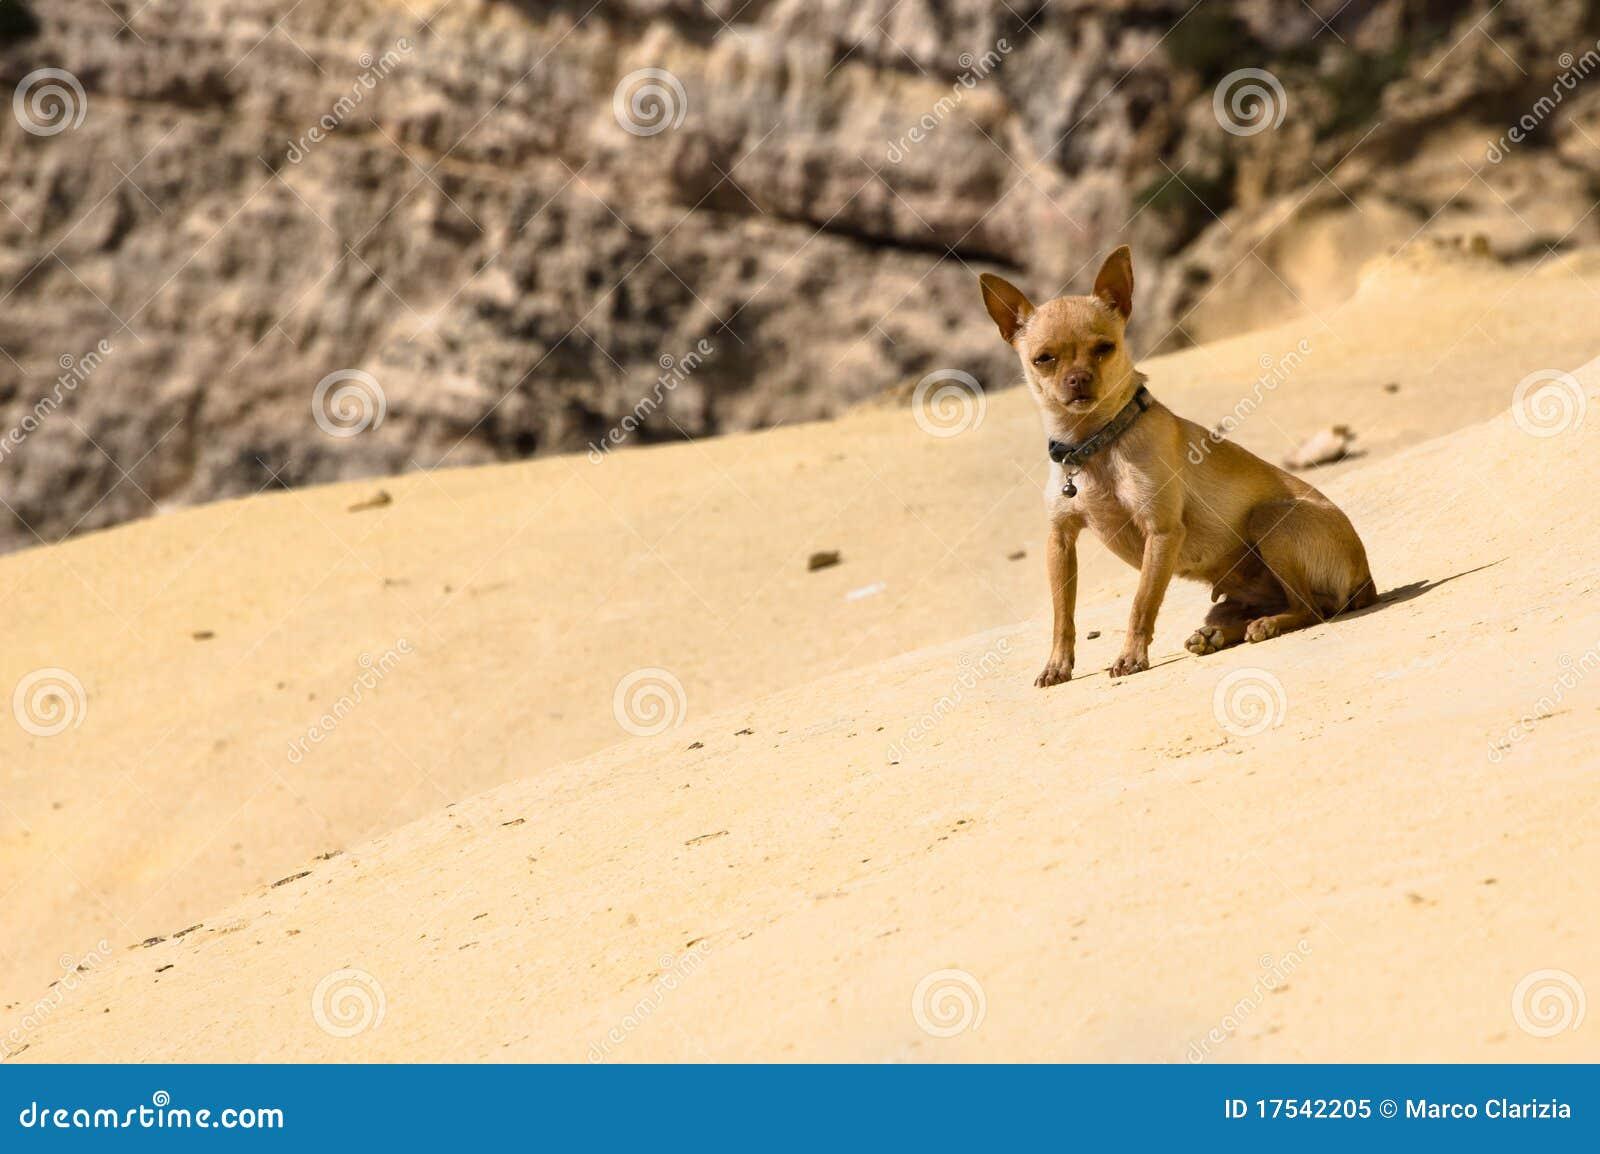 desert chihuahua royalty free stock photo image 17542205 free vector glass buttons free vector glass buttons